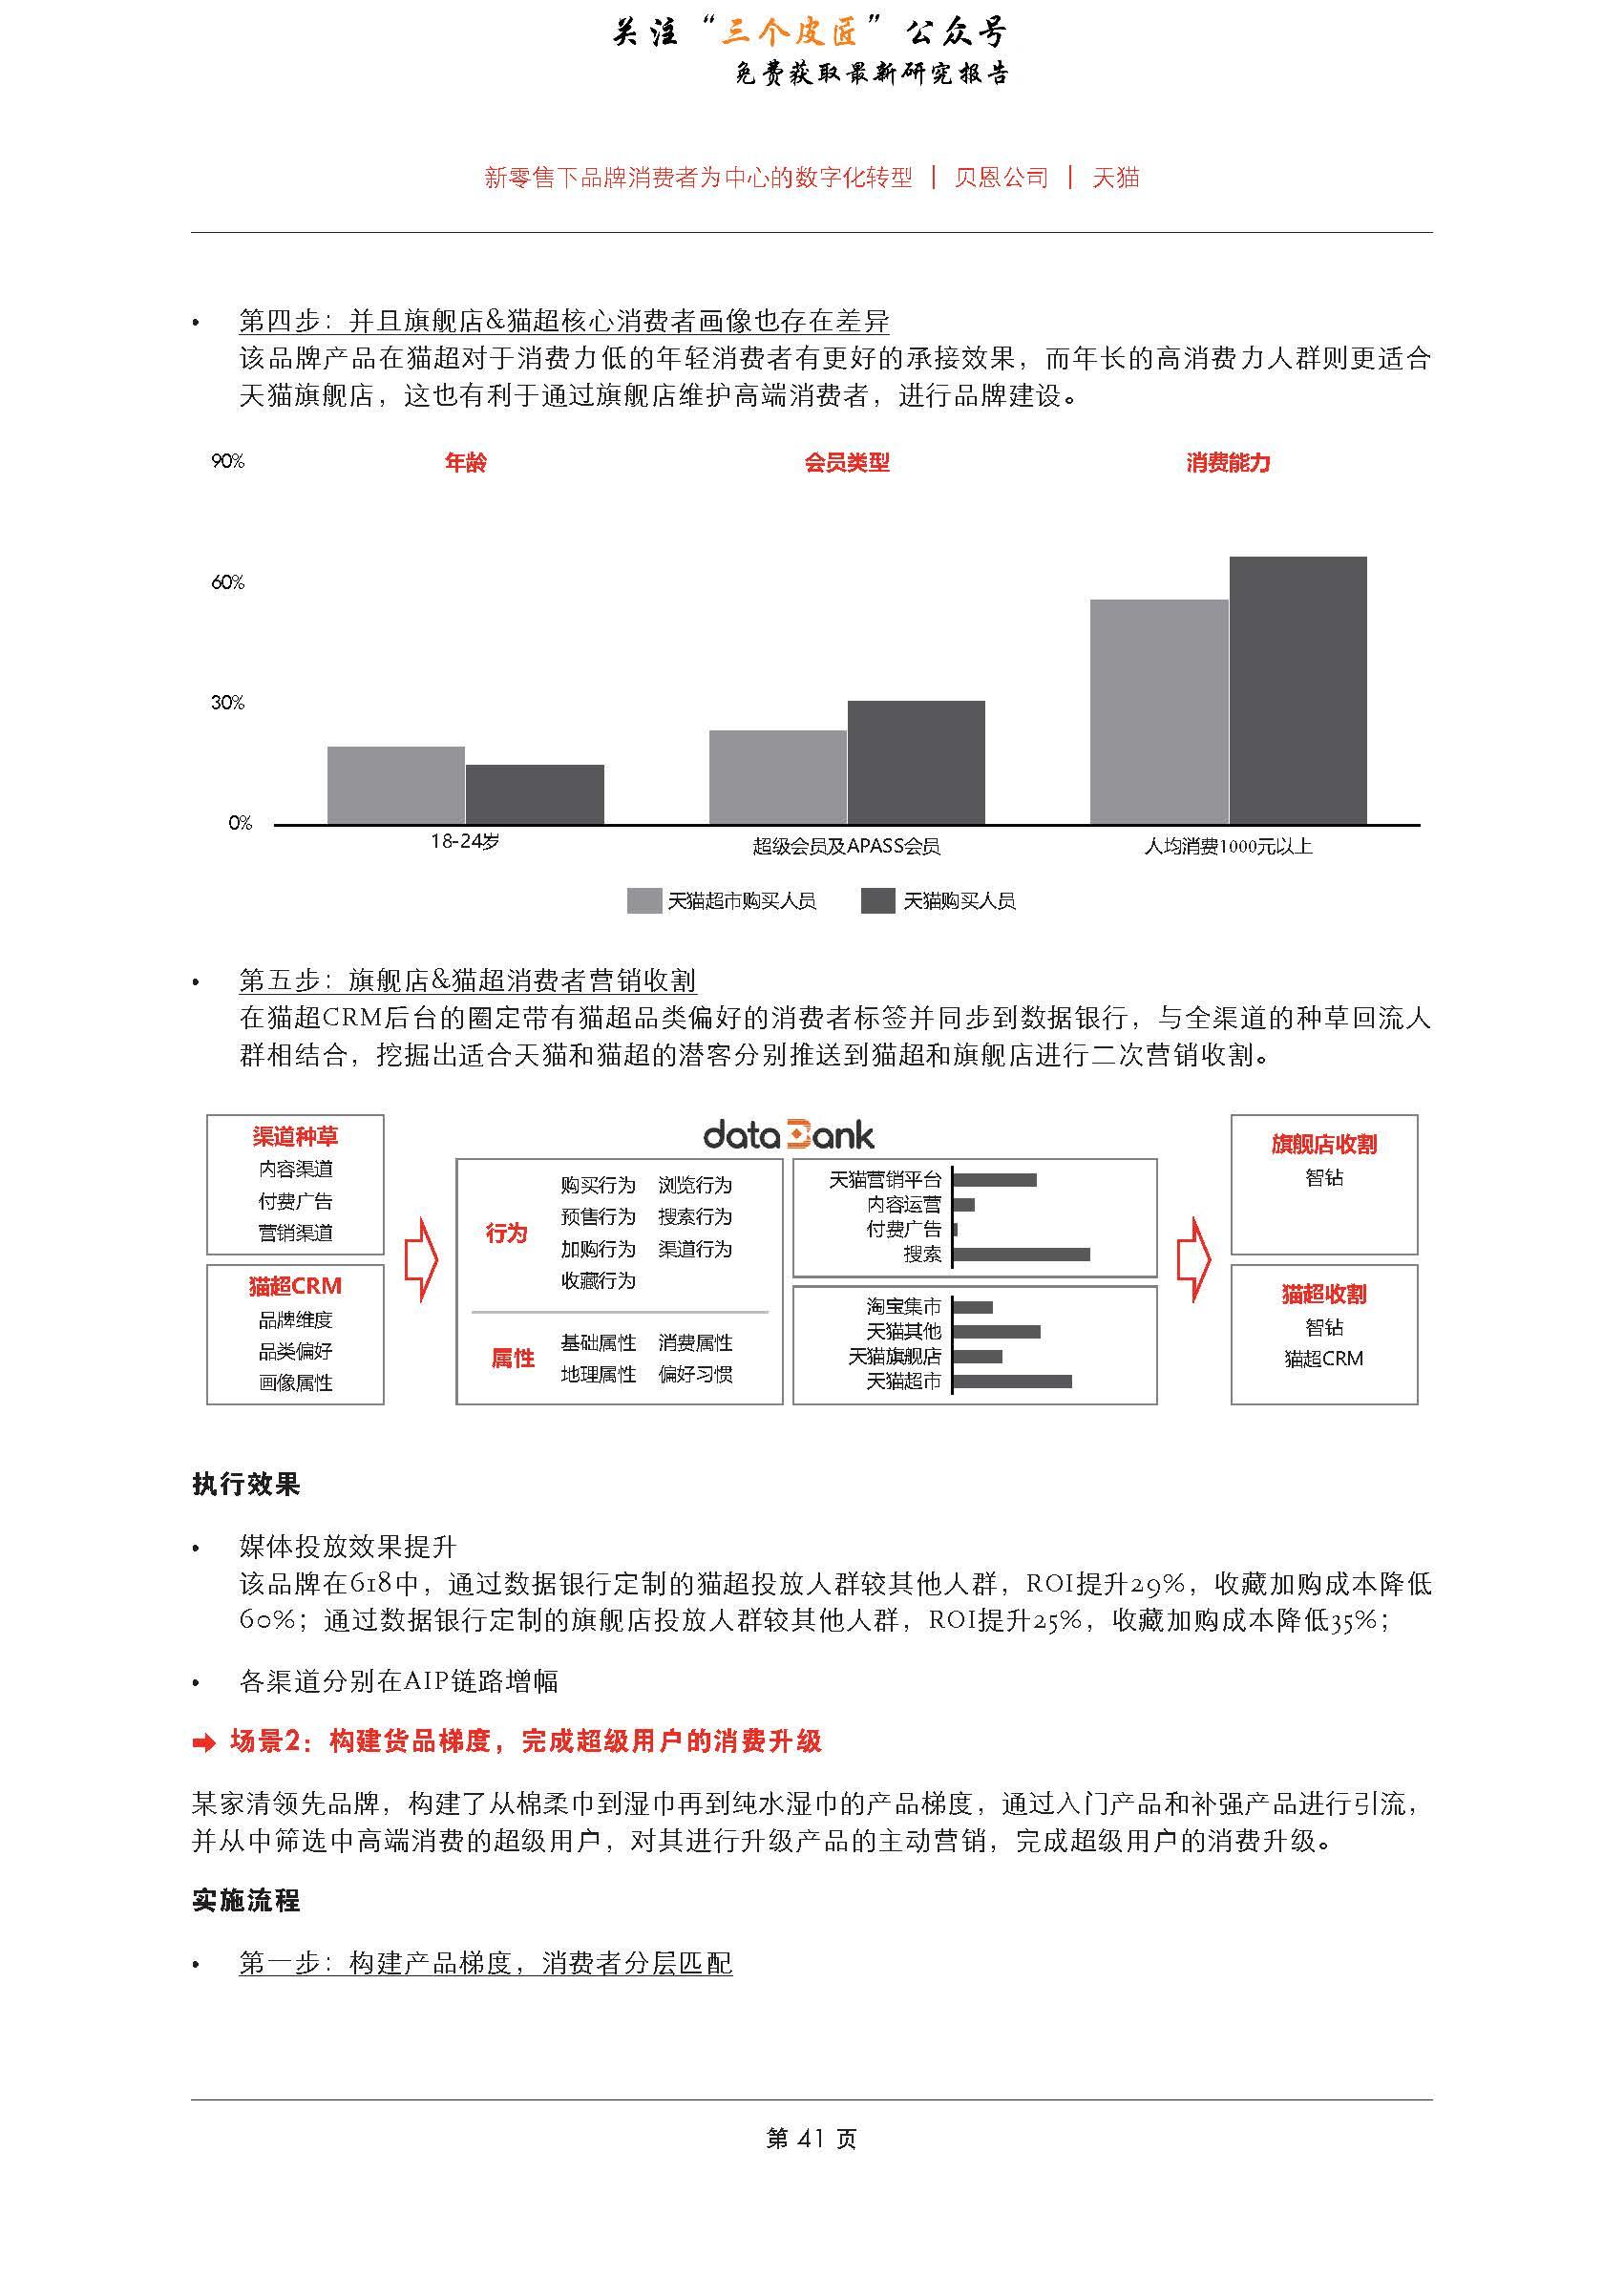 1_Page_43.jpg